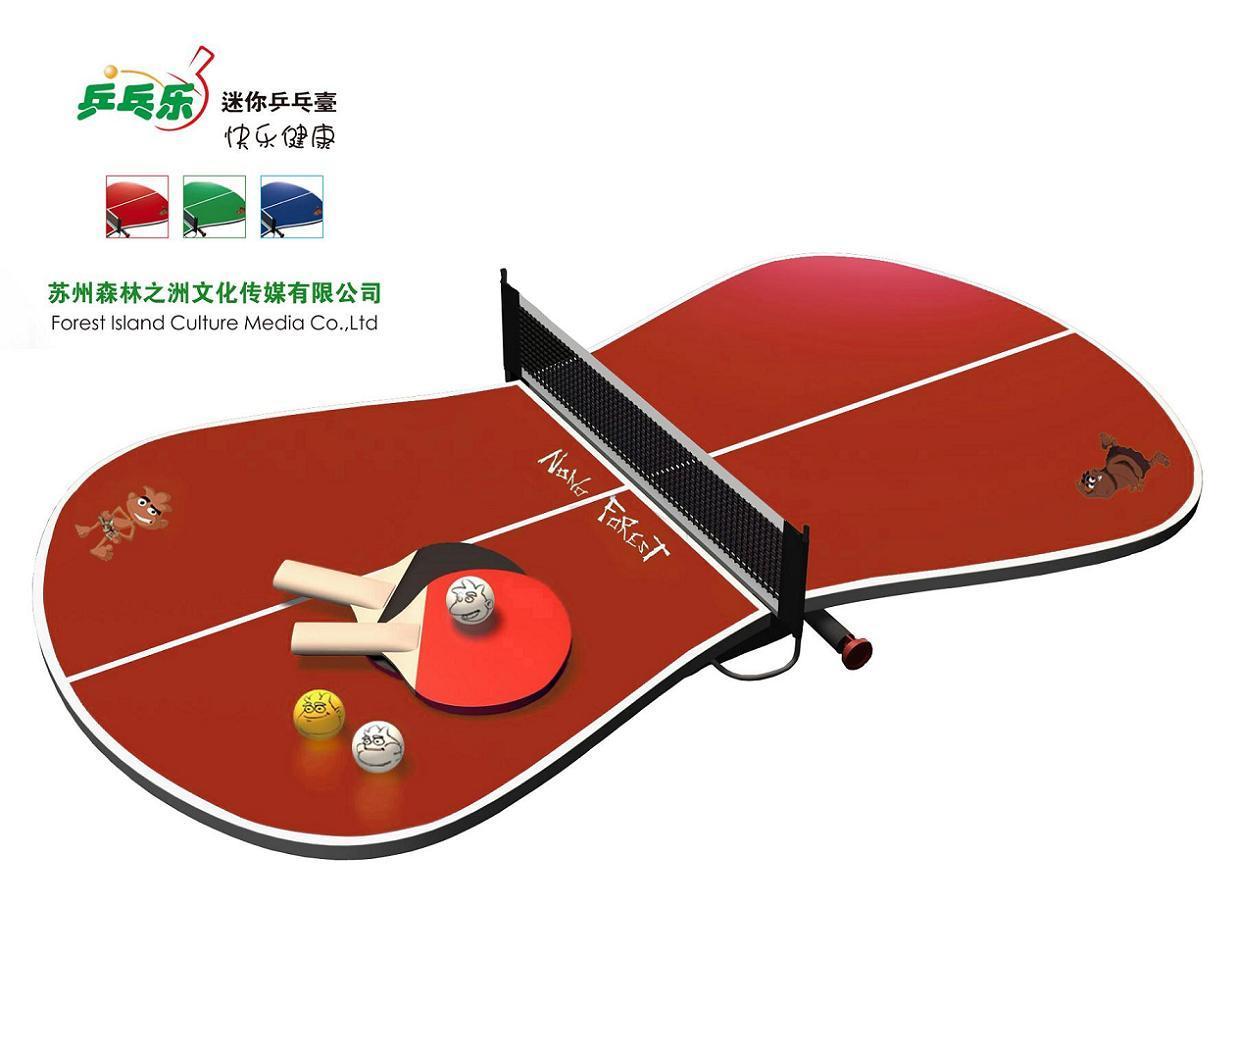 mini tabla de ping pong portable rojo yy12tts02 r mini tabla de ping pong portable rojo. Black Bedroom Furniture Sets. Home Design Ideas